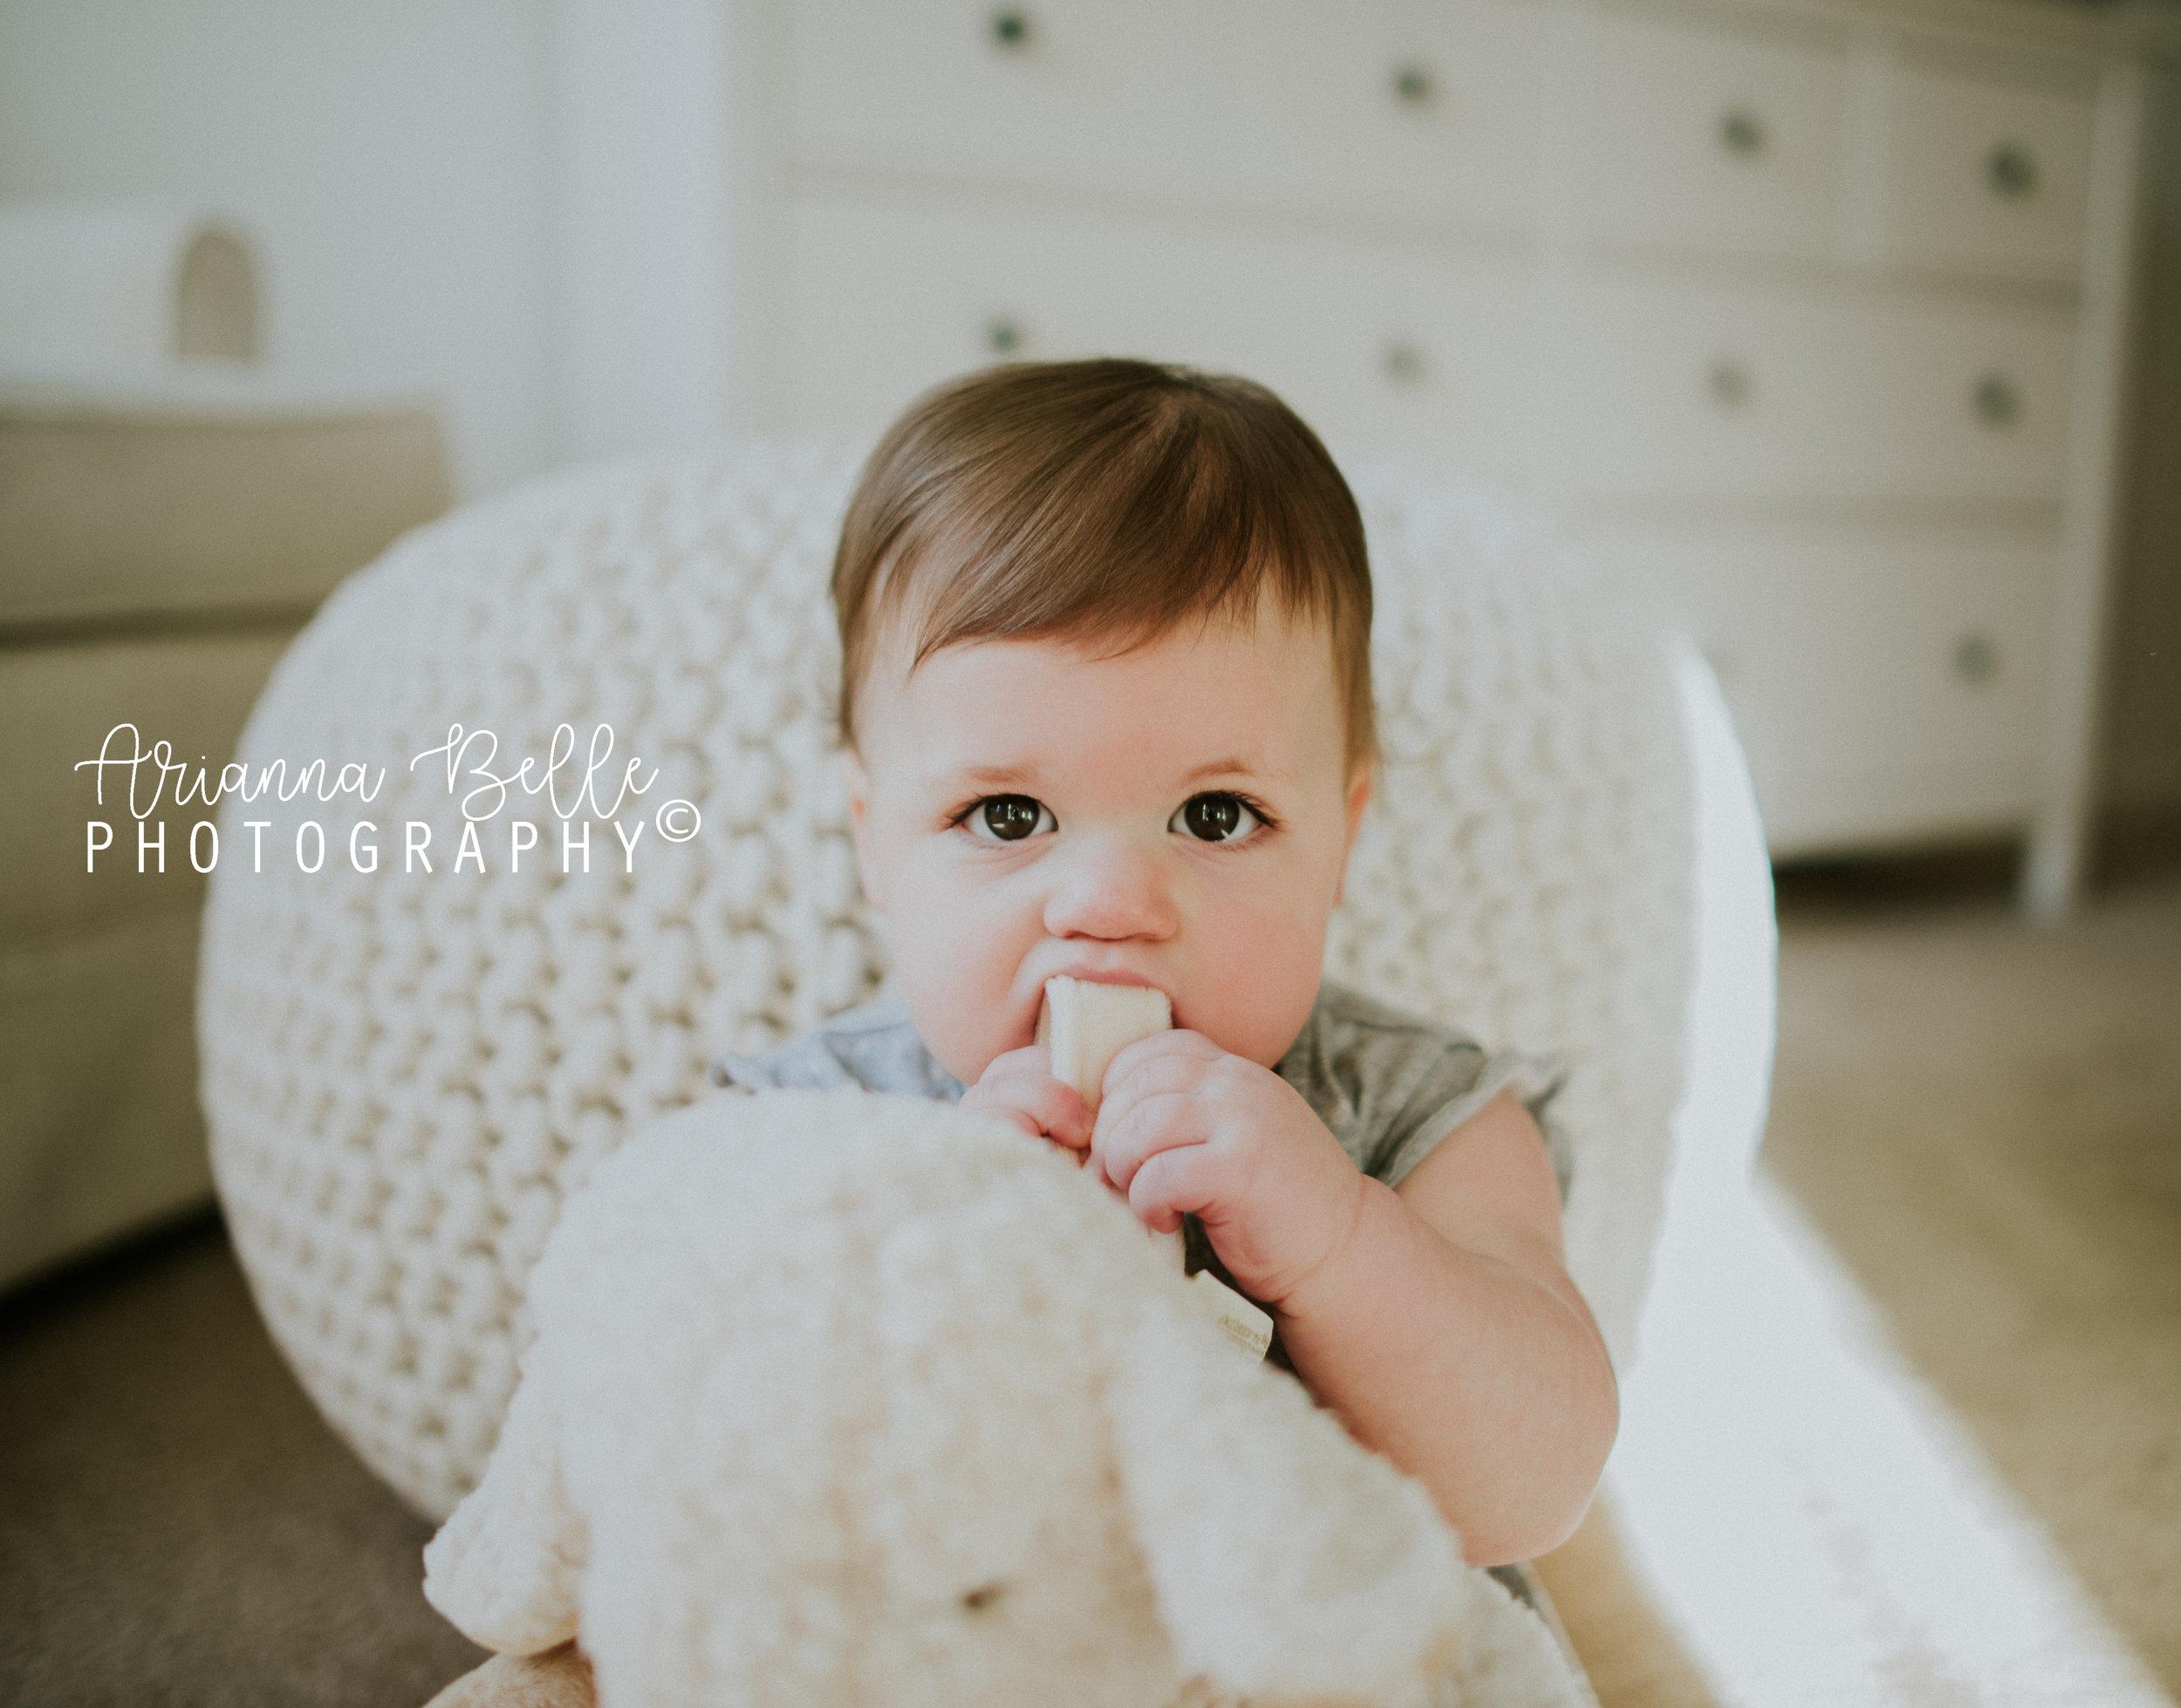 Big baby eyes